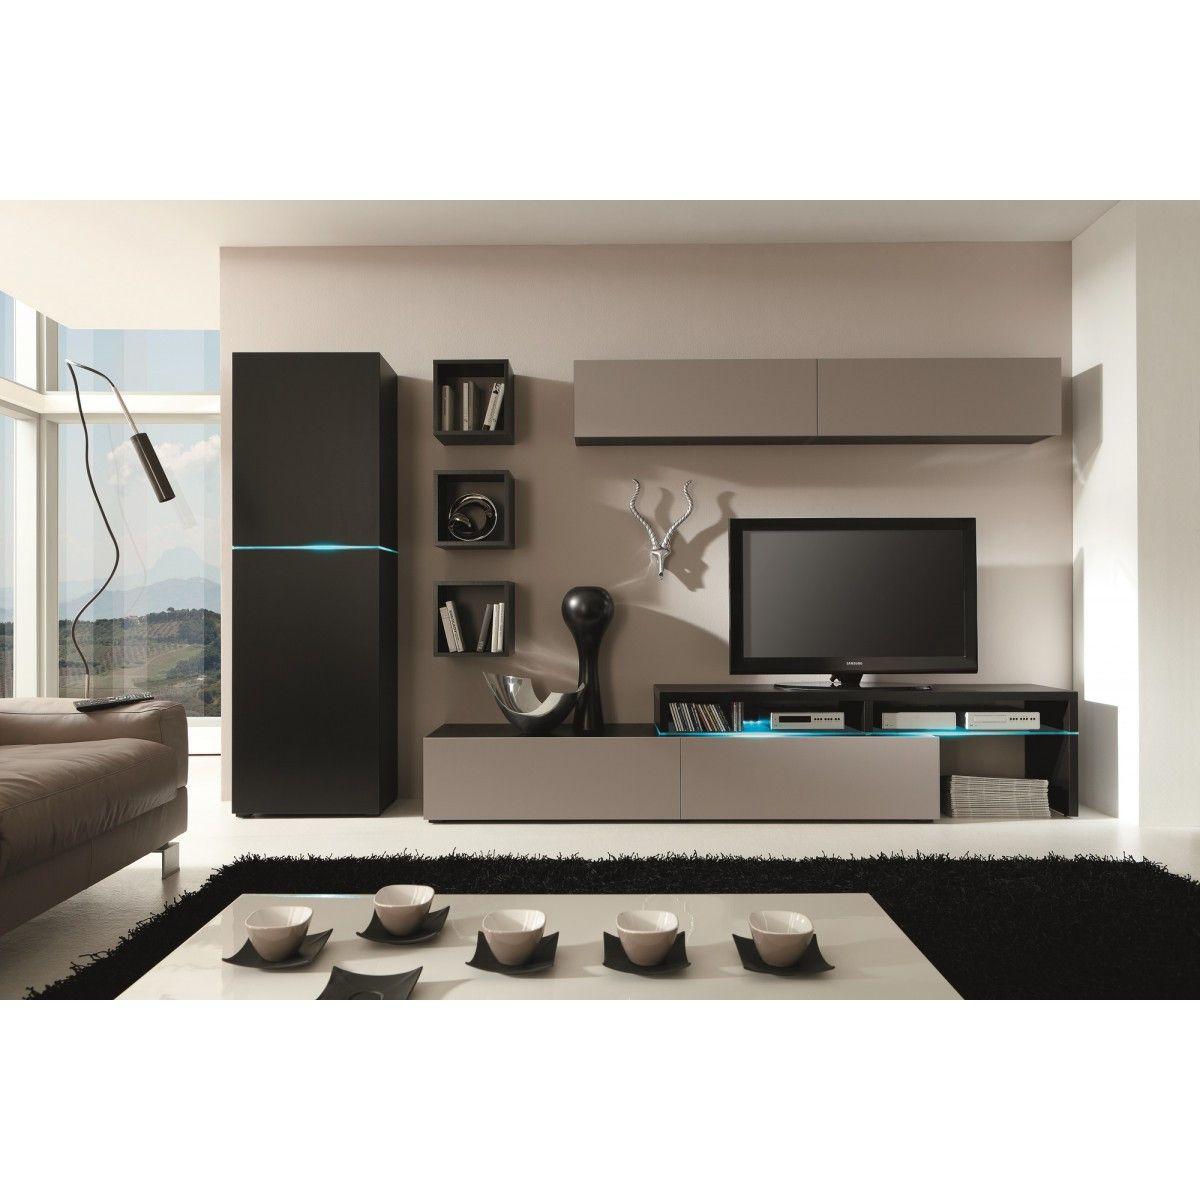 Material mdf melamine tempered glass led lighting the - Storage units living room furniture ...